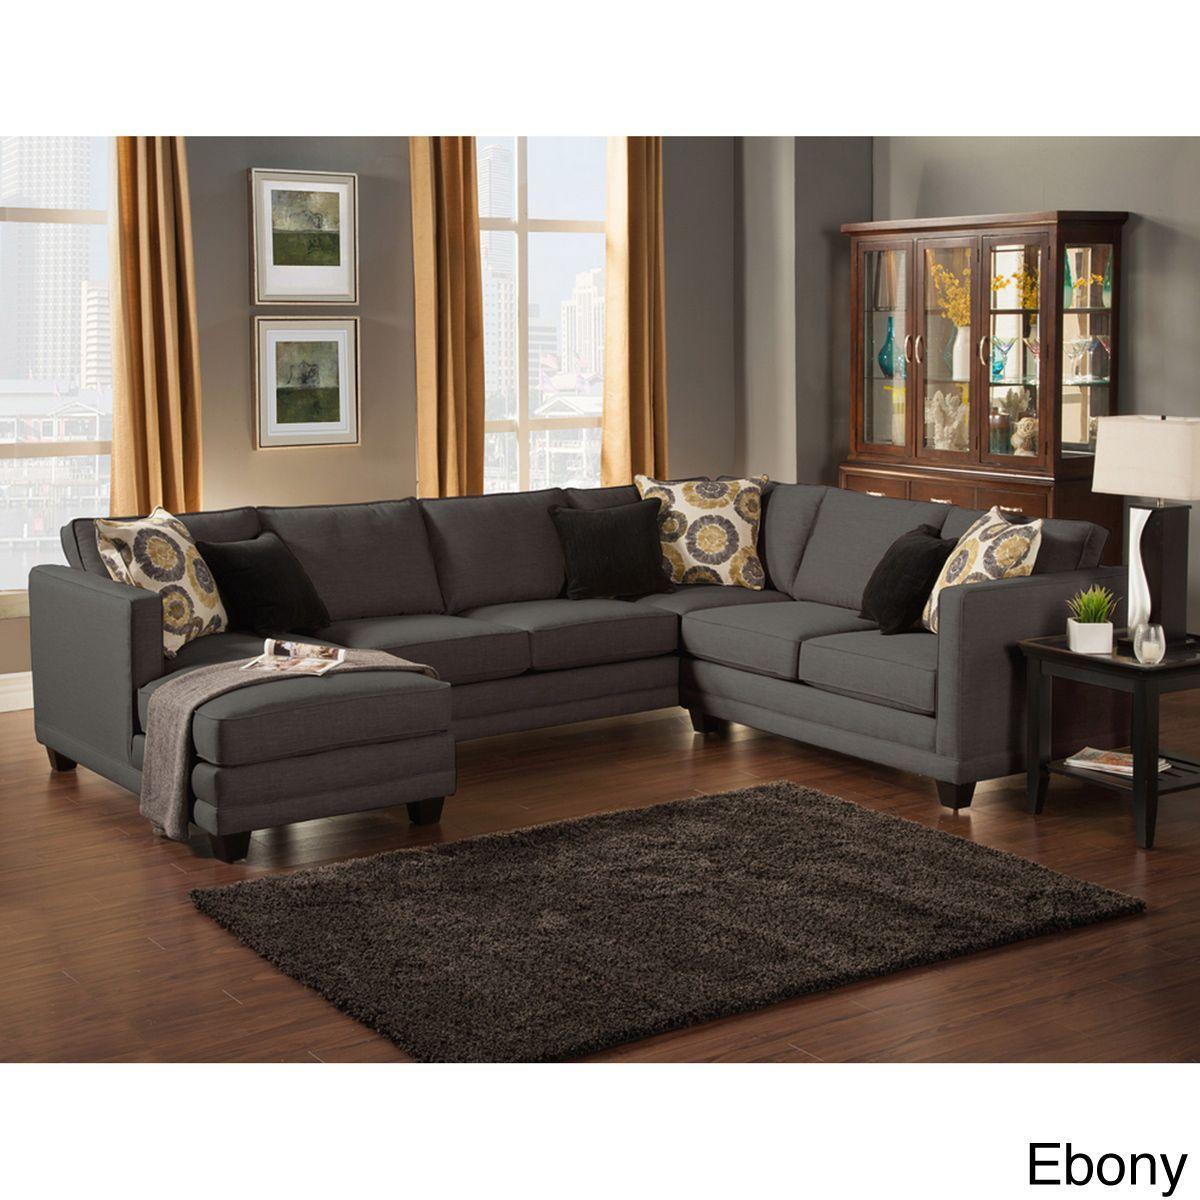 furniture of america zeal lavish contemporary 3 piece fabric